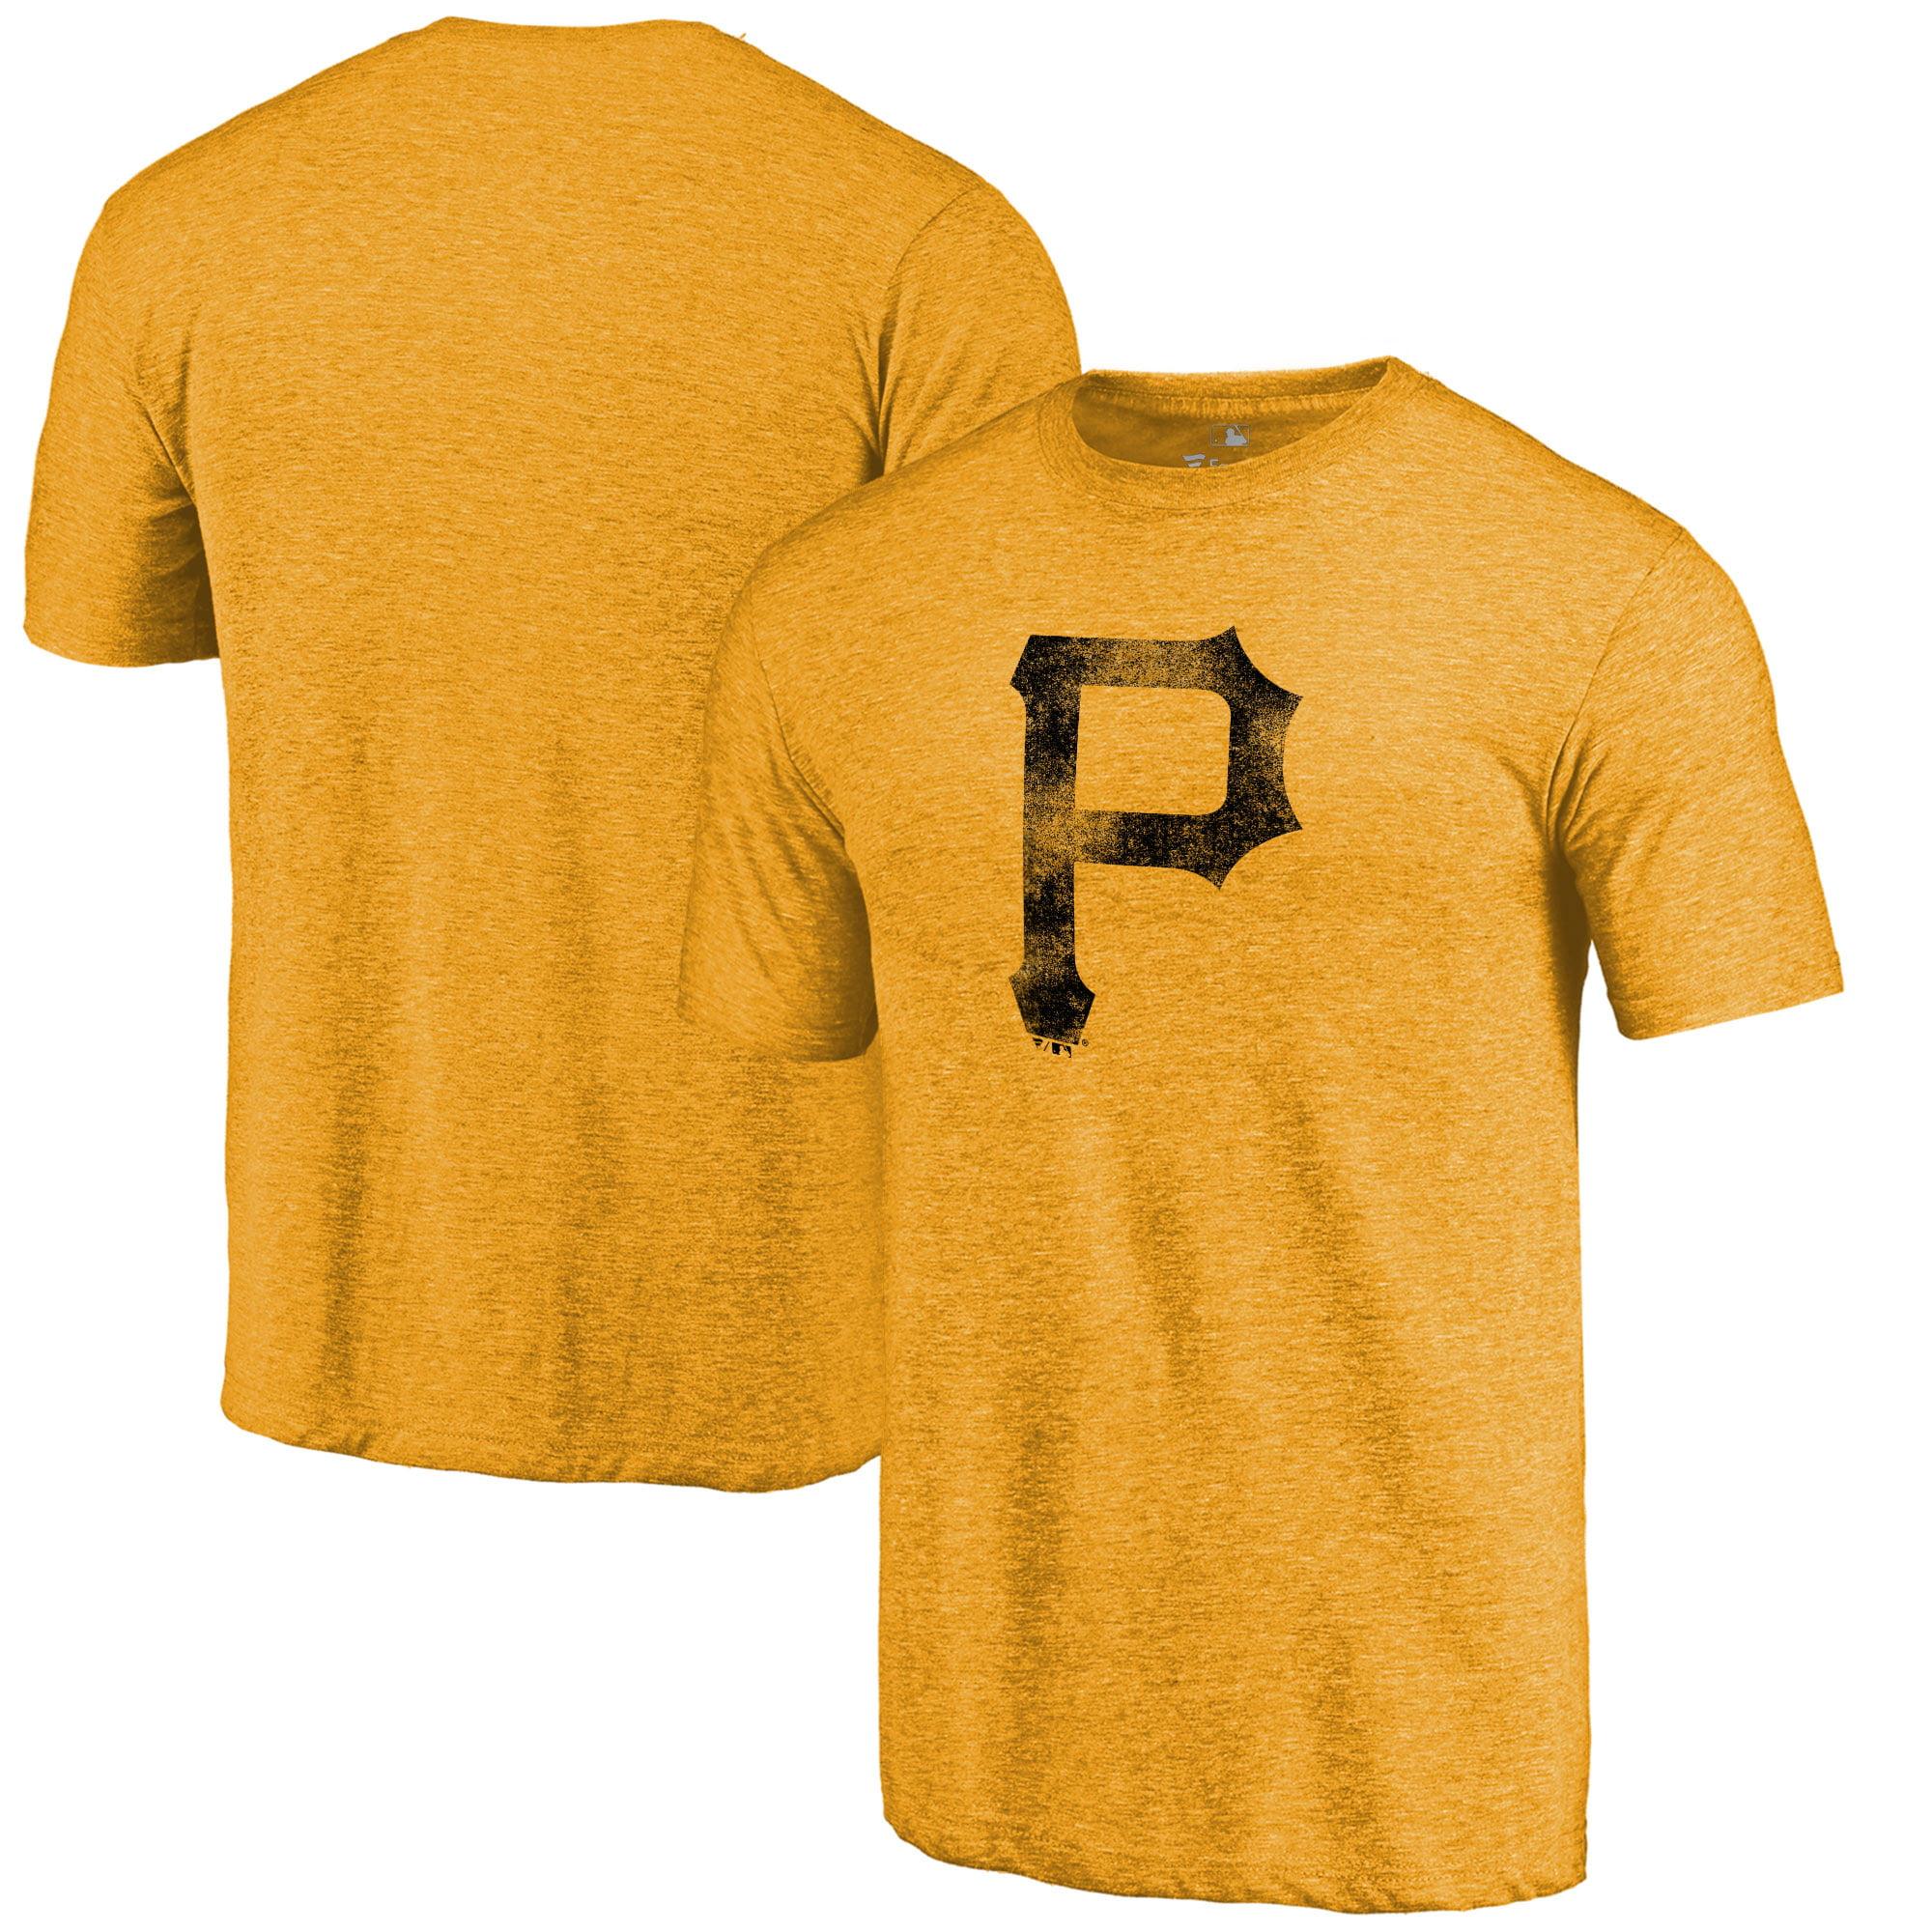 Pittsburgh Pirates Fanatics Branded Team Tri-Blend T-Shirt - Gold